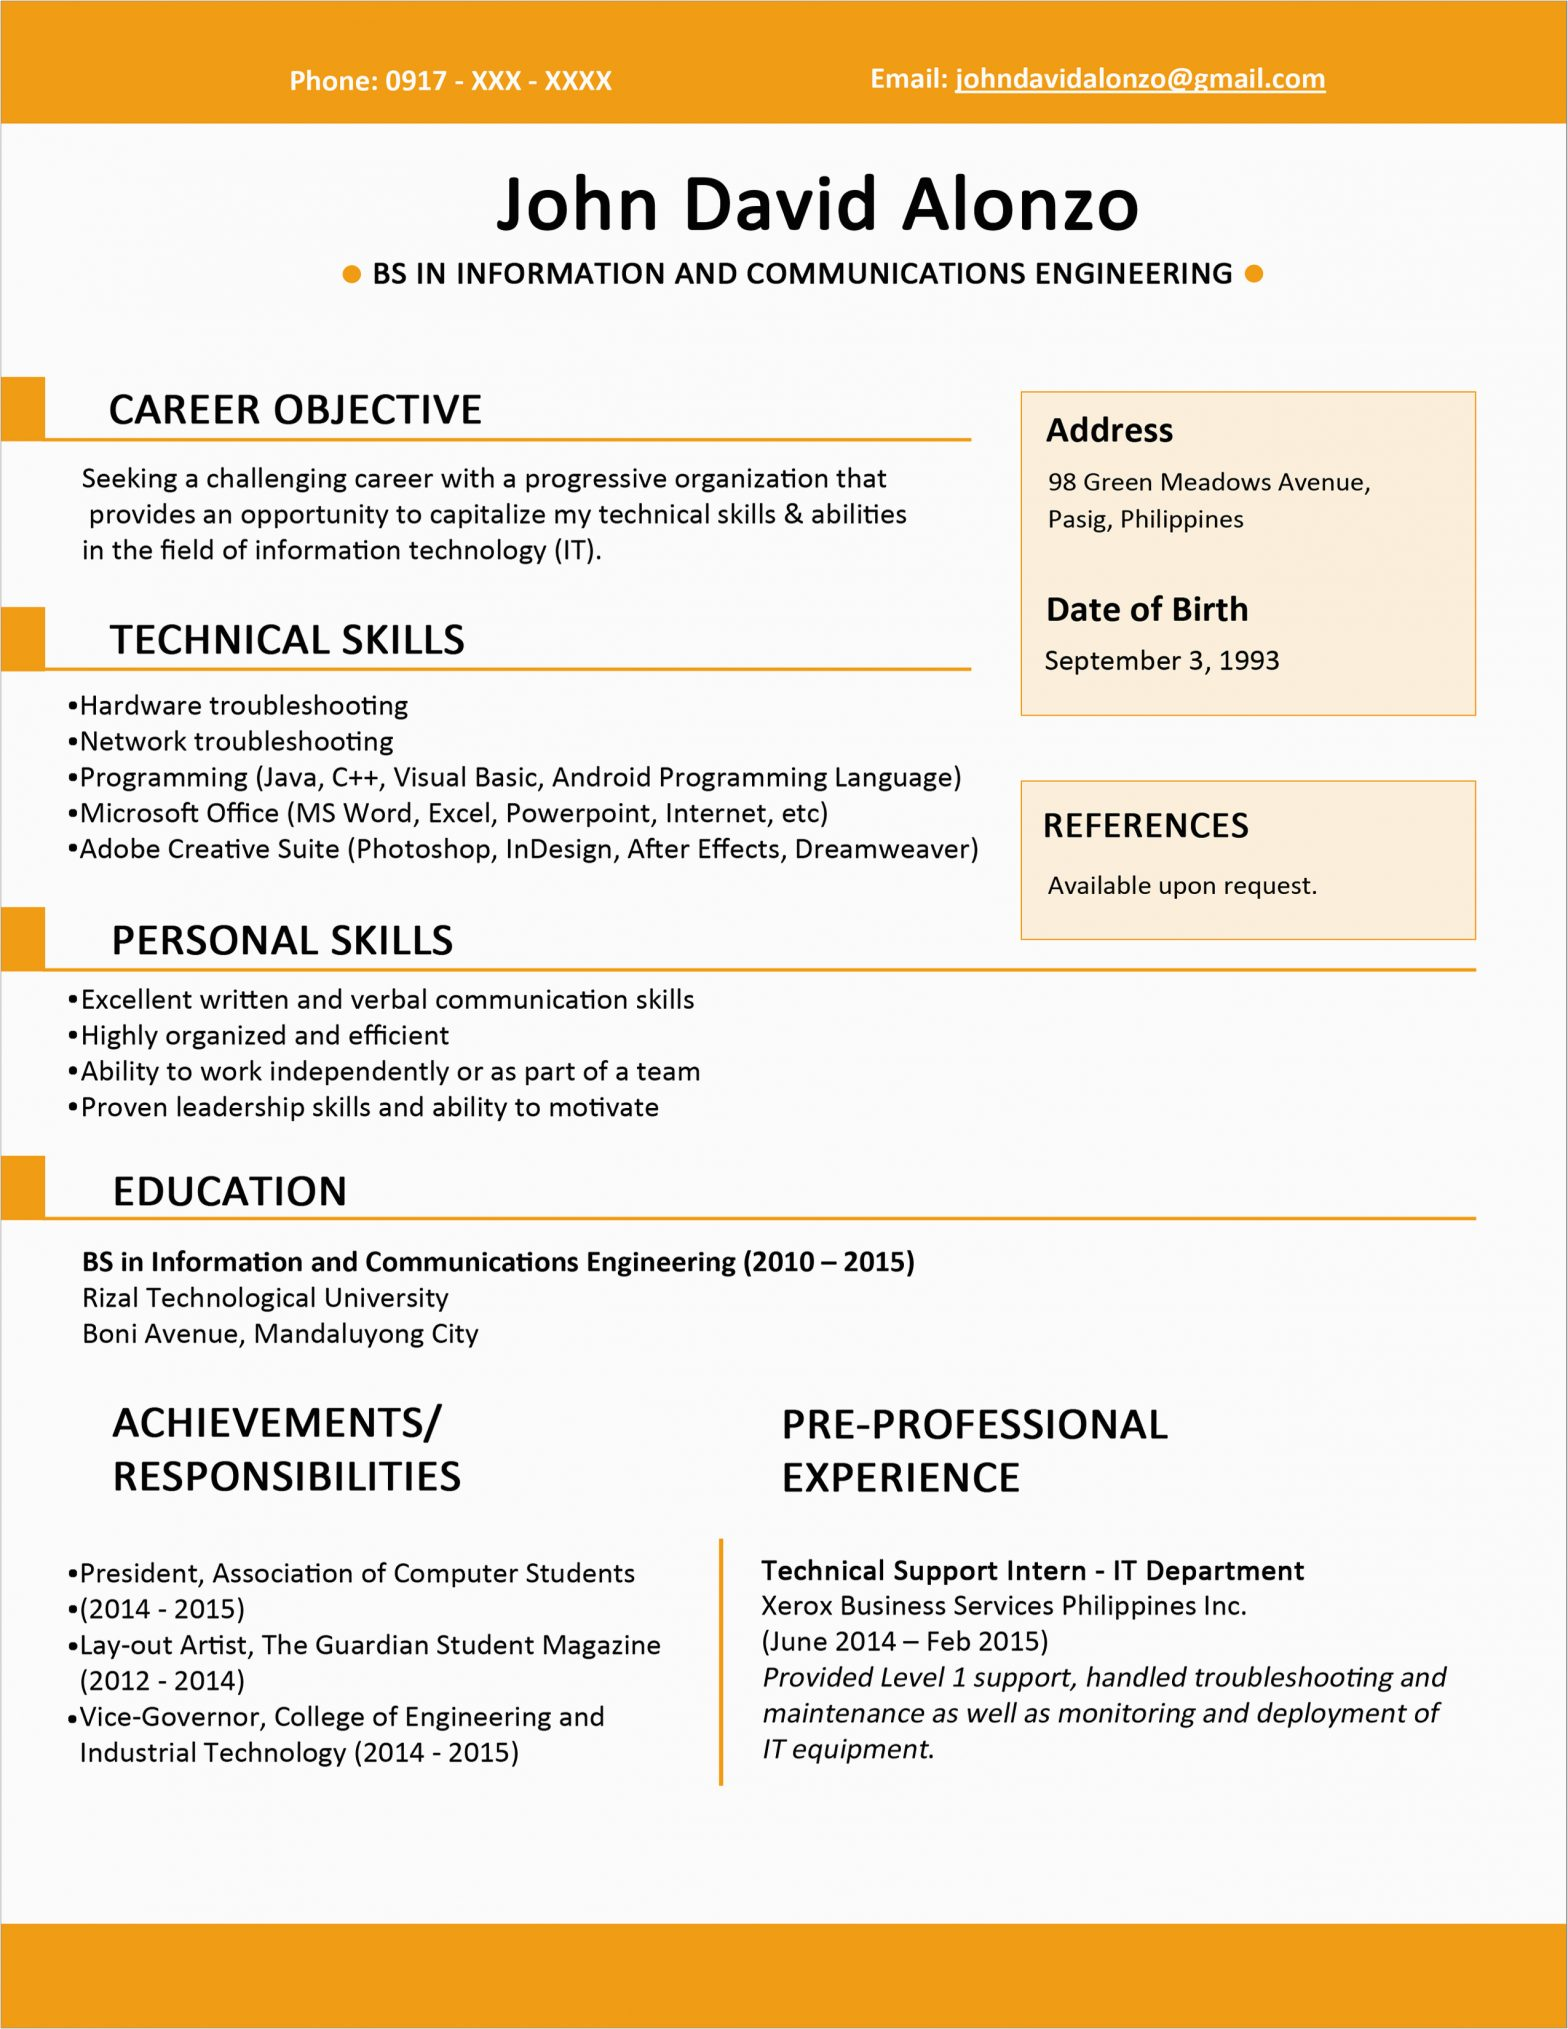 Resume Sample for It Fresh Graduate Sample Resume format for Fresh Graduates E Page format